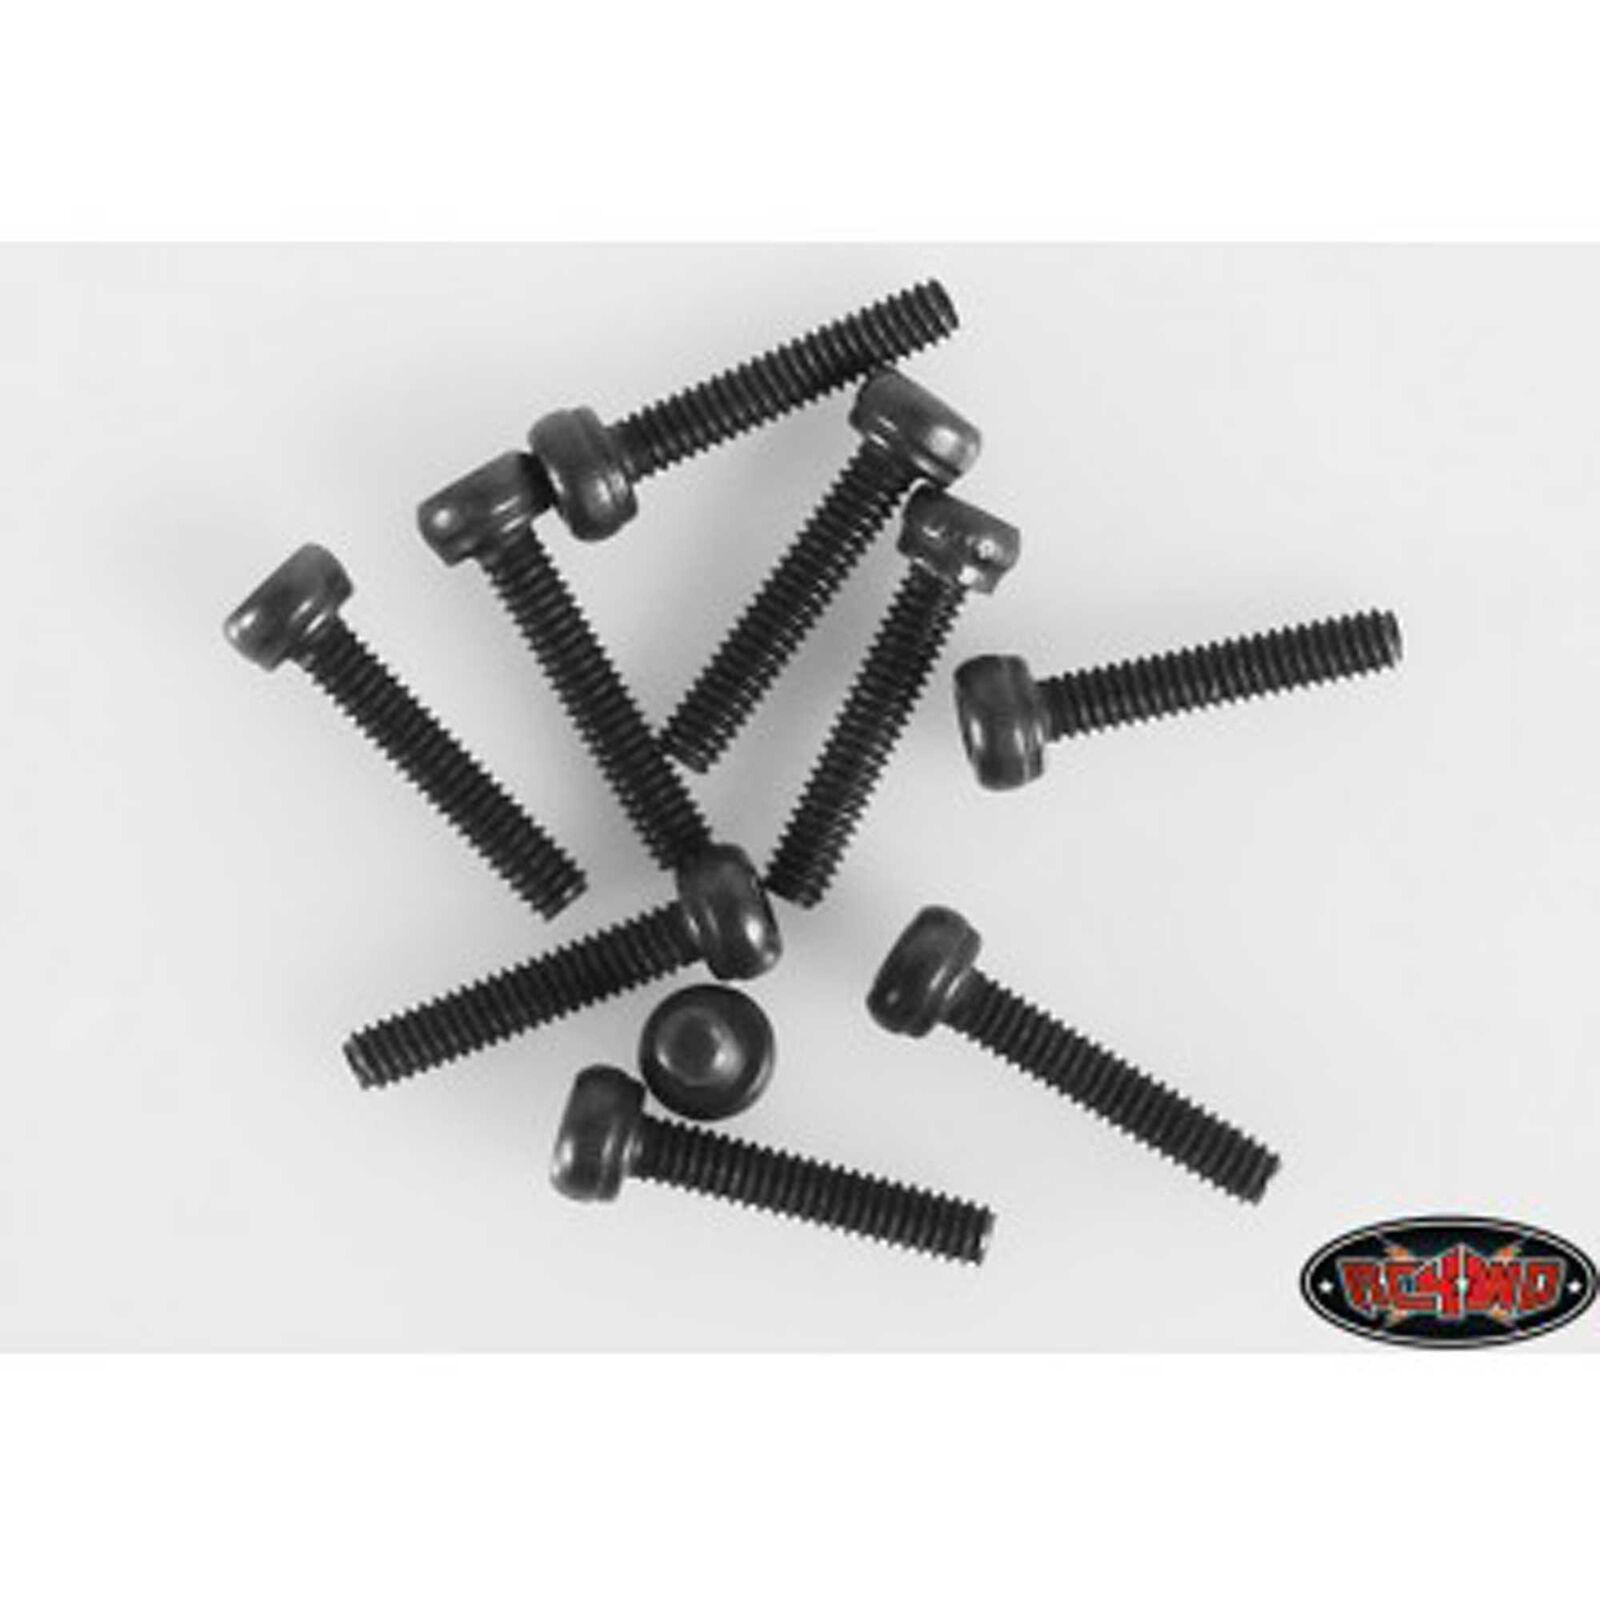 Steel Socket Head Cap Screws M2 x 10mm (10)